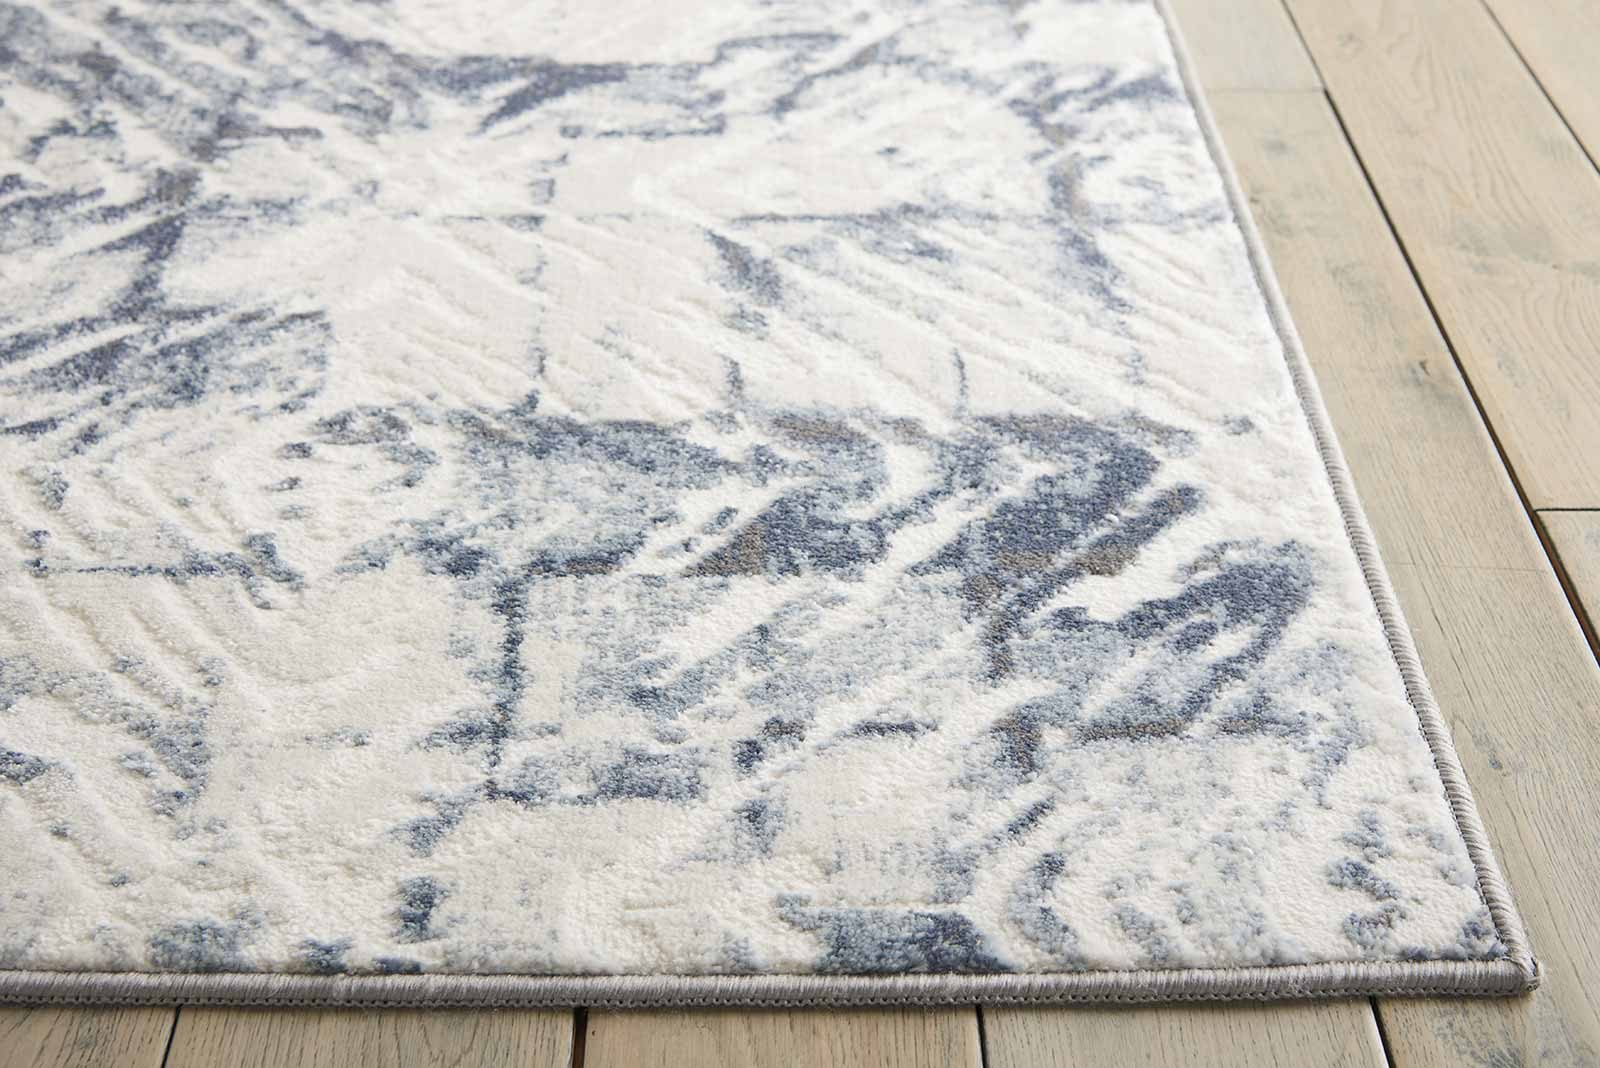 Nourison rug Urban Decor URD02 IVORY BLUE 5x7 099446466976 DT01